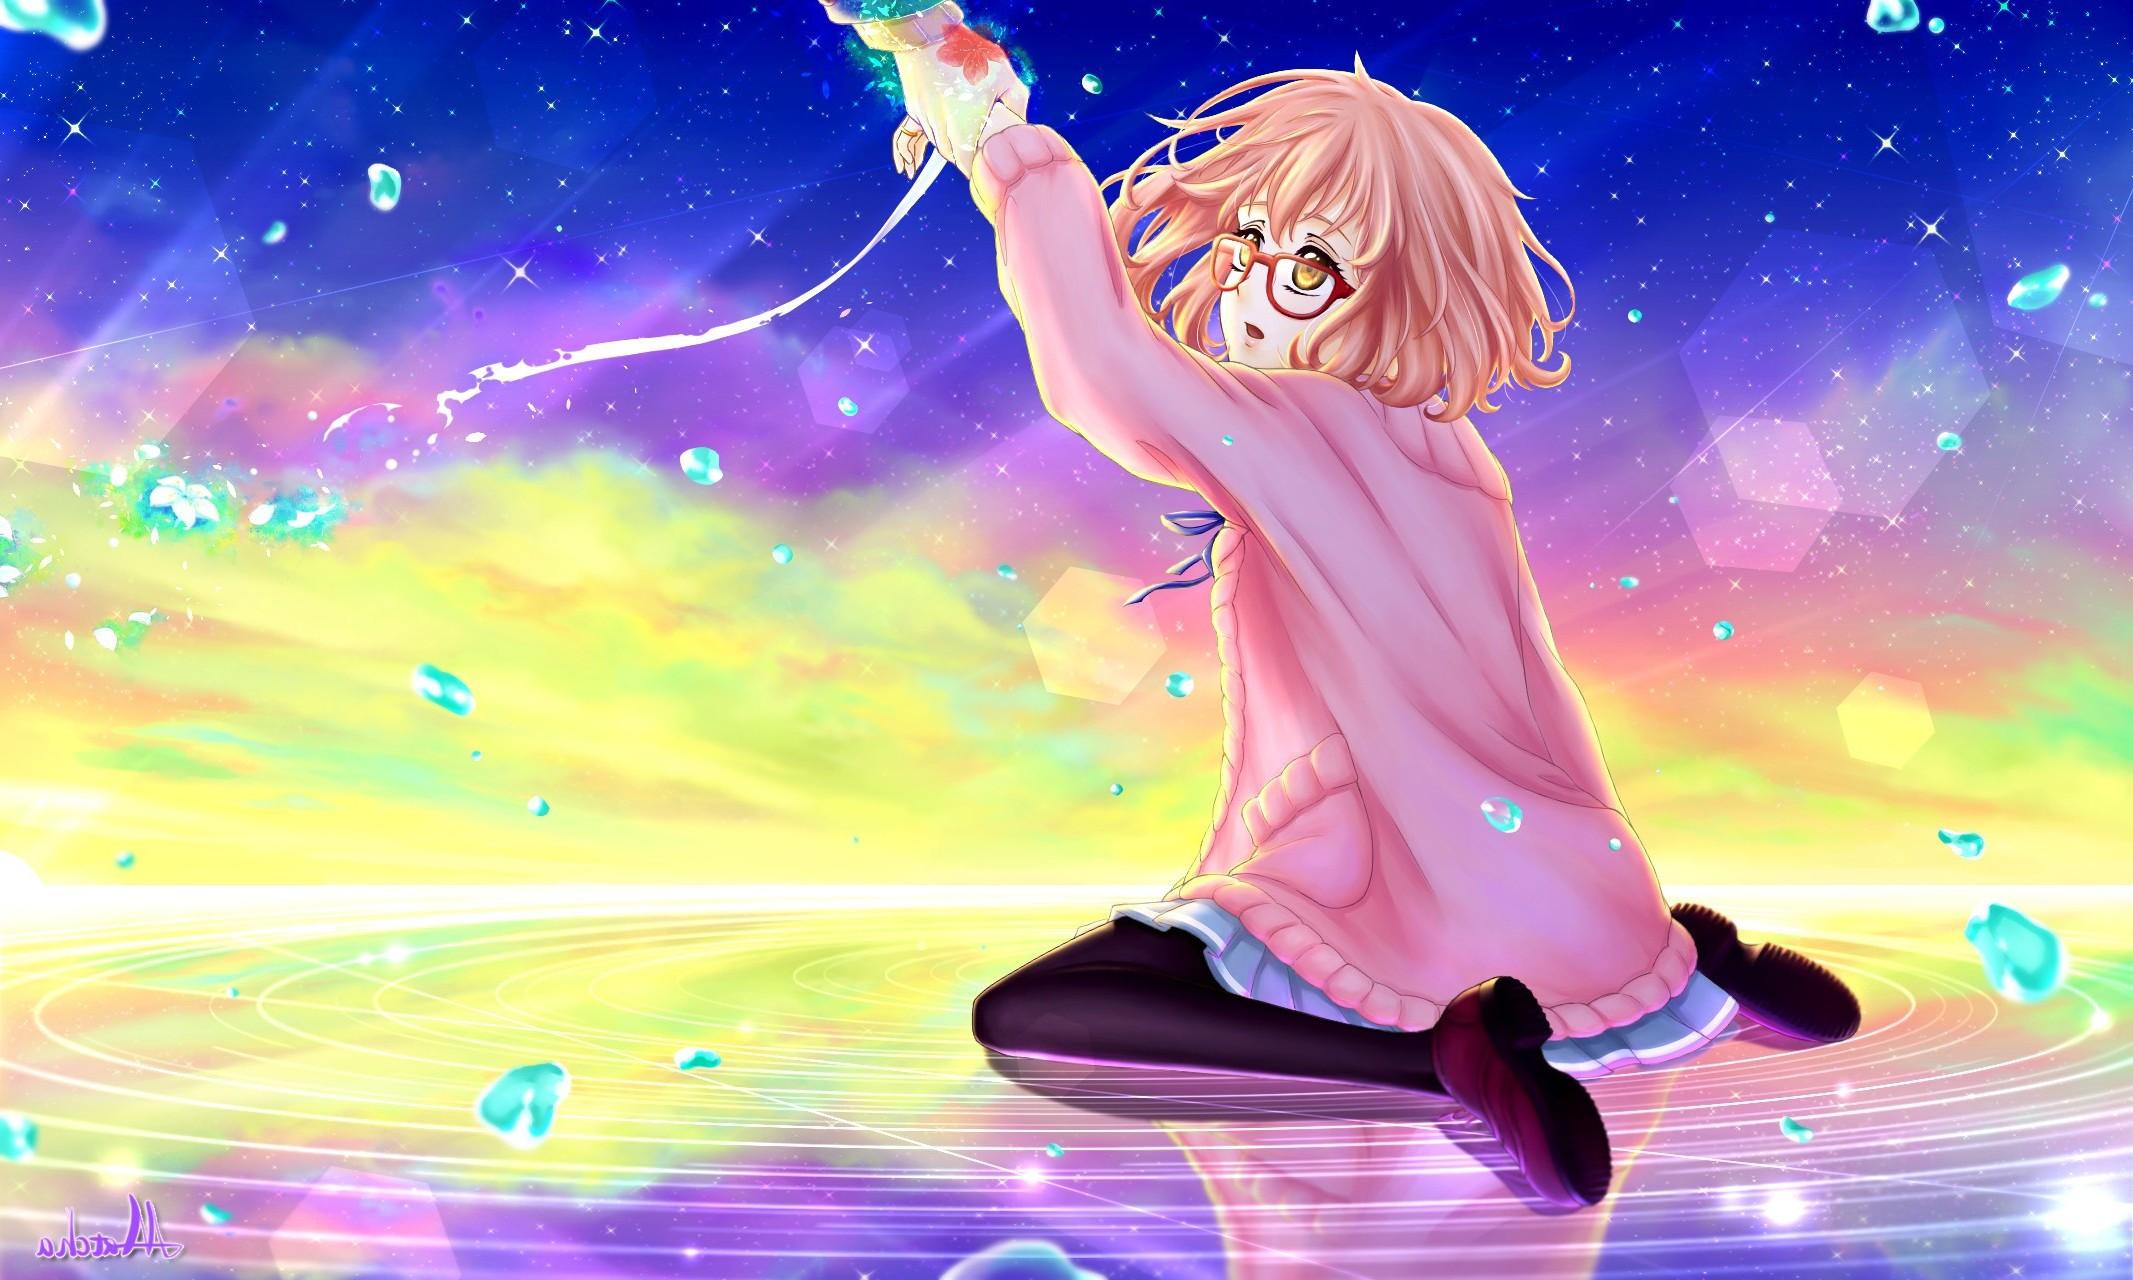 Wallpaper 2133x1280 Px Anime Girls Kuriyama Mirai